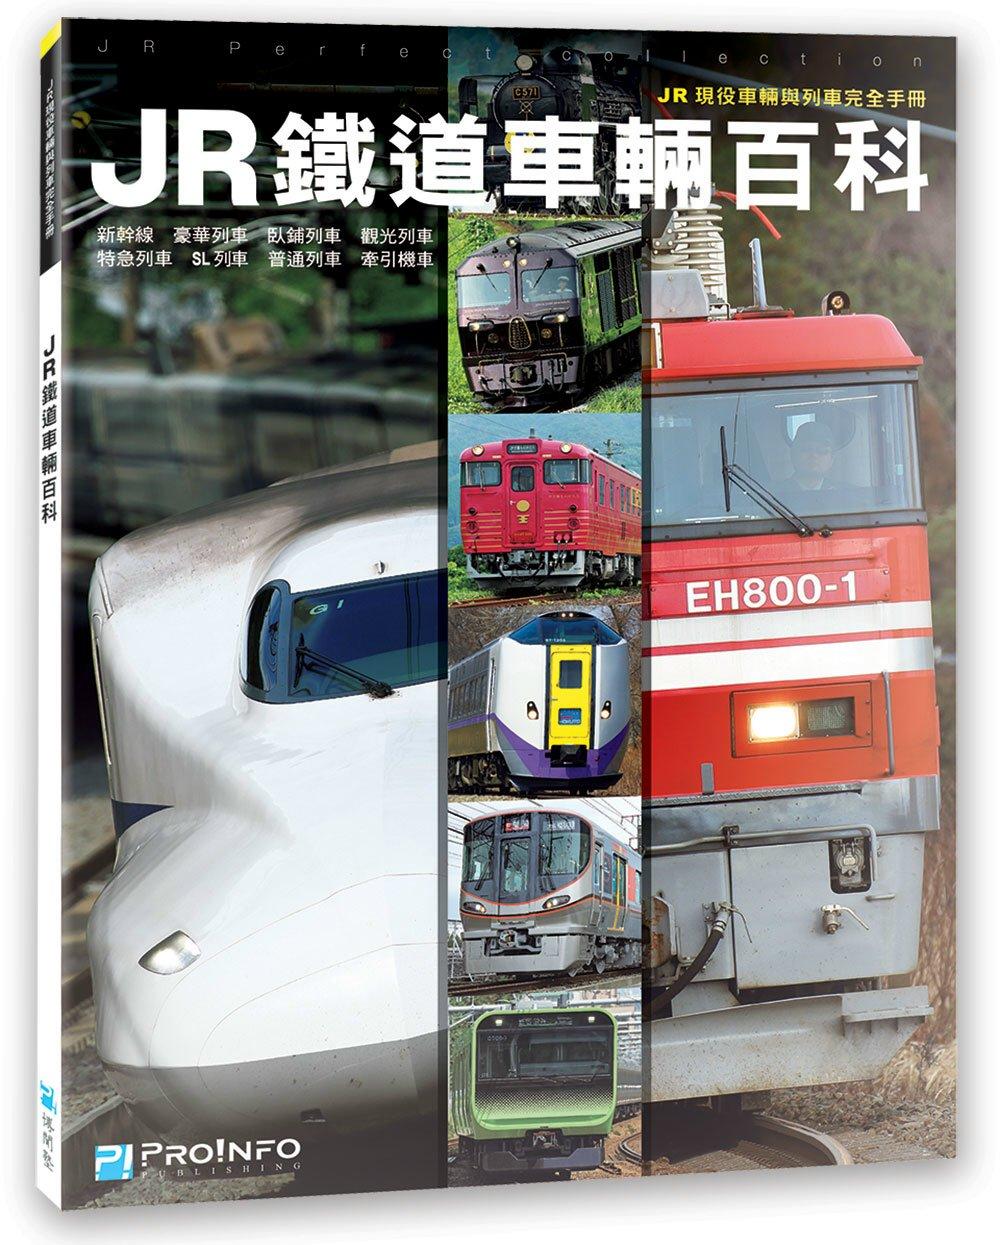 JR鐵道車輛百科:JR現役車輛與列車完全手冊